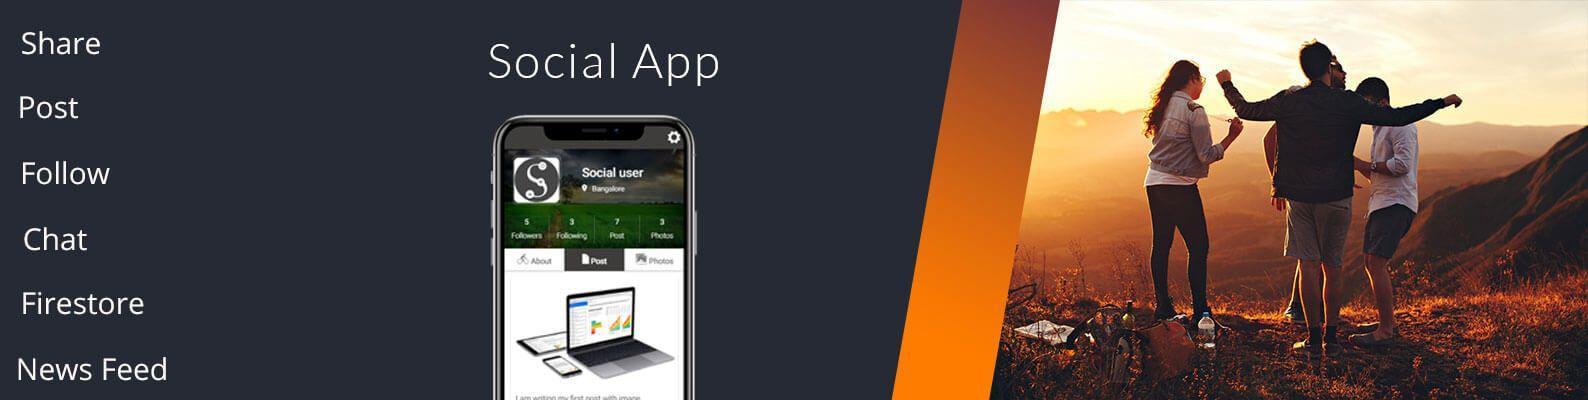 ionic firestore social app